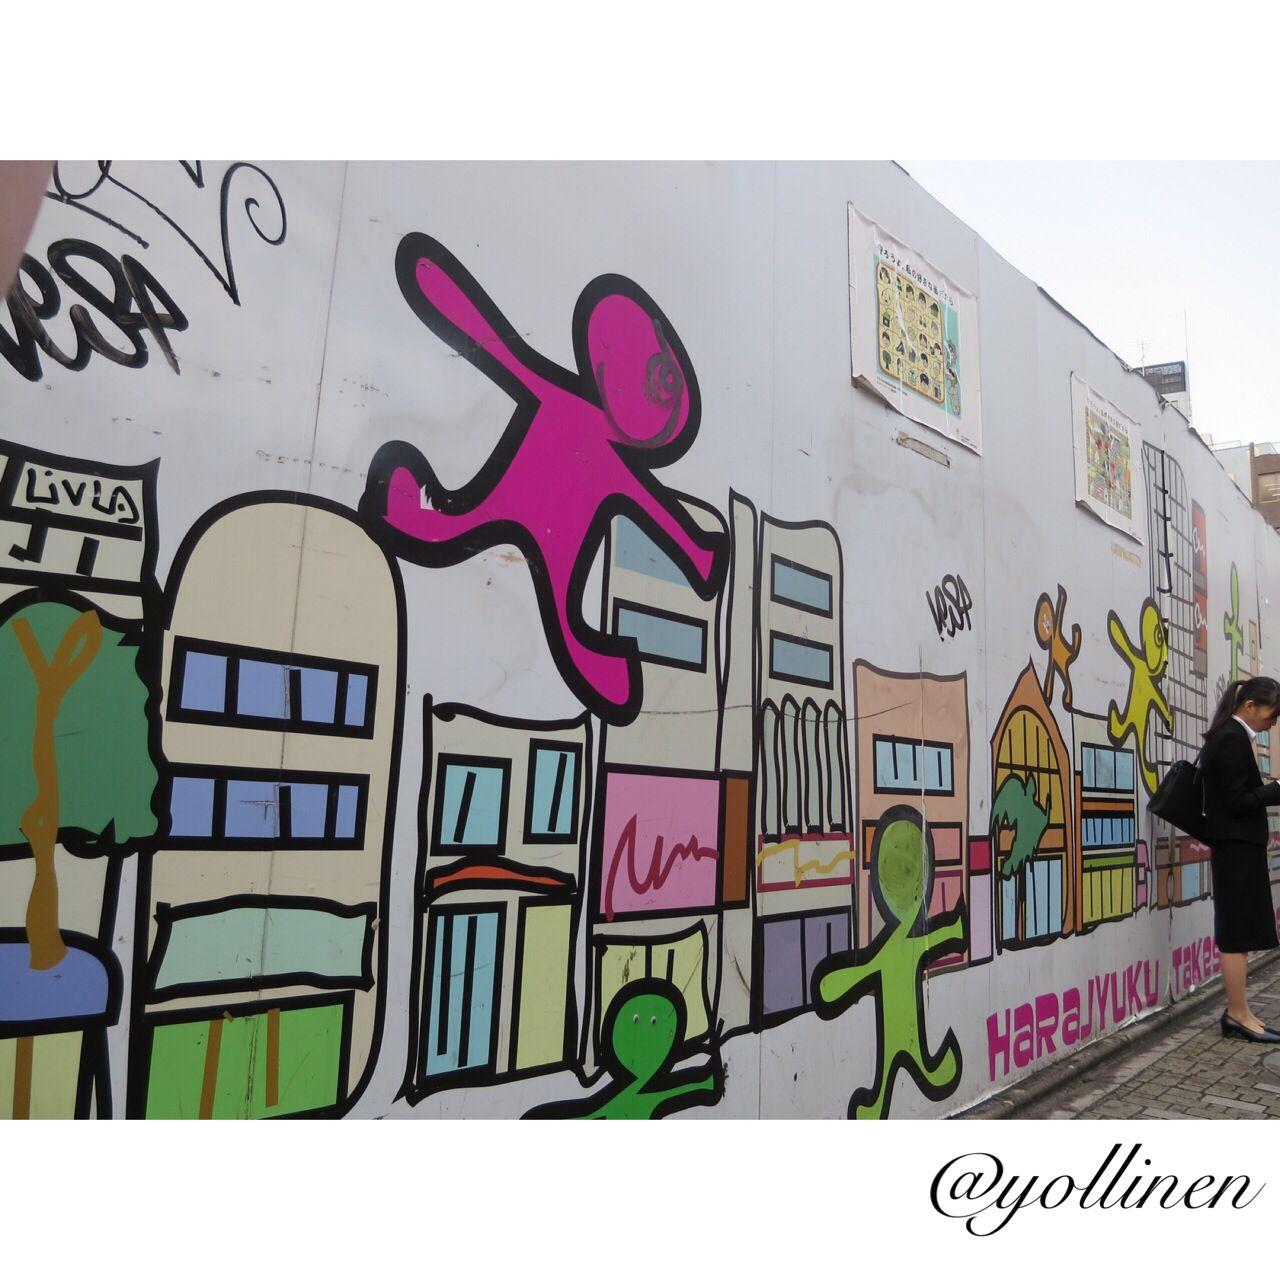 Graffiti wall tokyo - Takeshita Street Graffiti Wall At Harajuku Tokyo Harajuku Takeshita Japan Canon